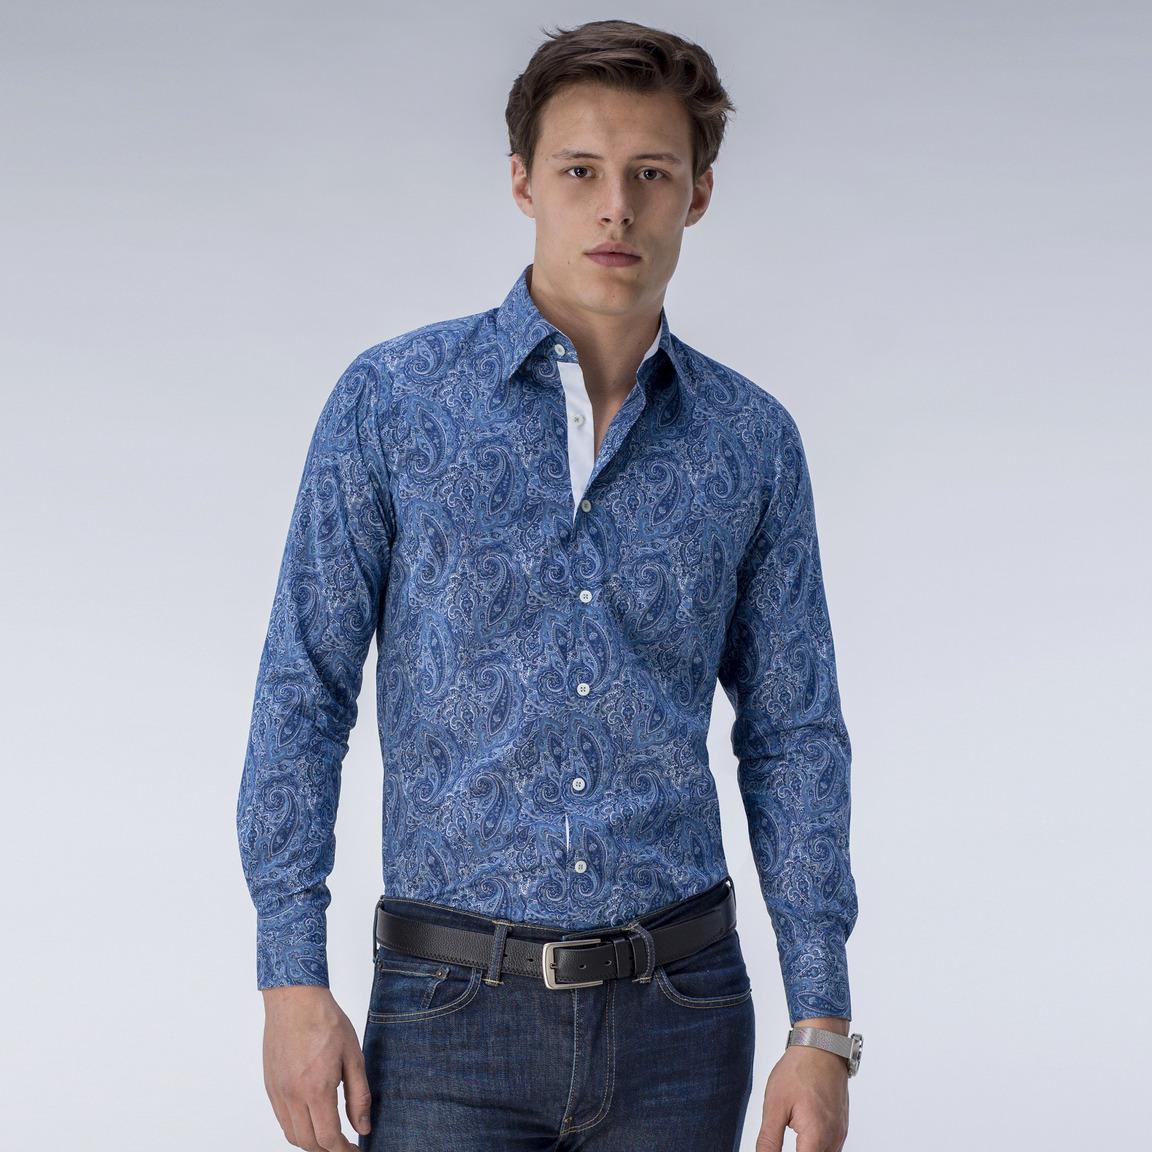 Blue paisley print shirt